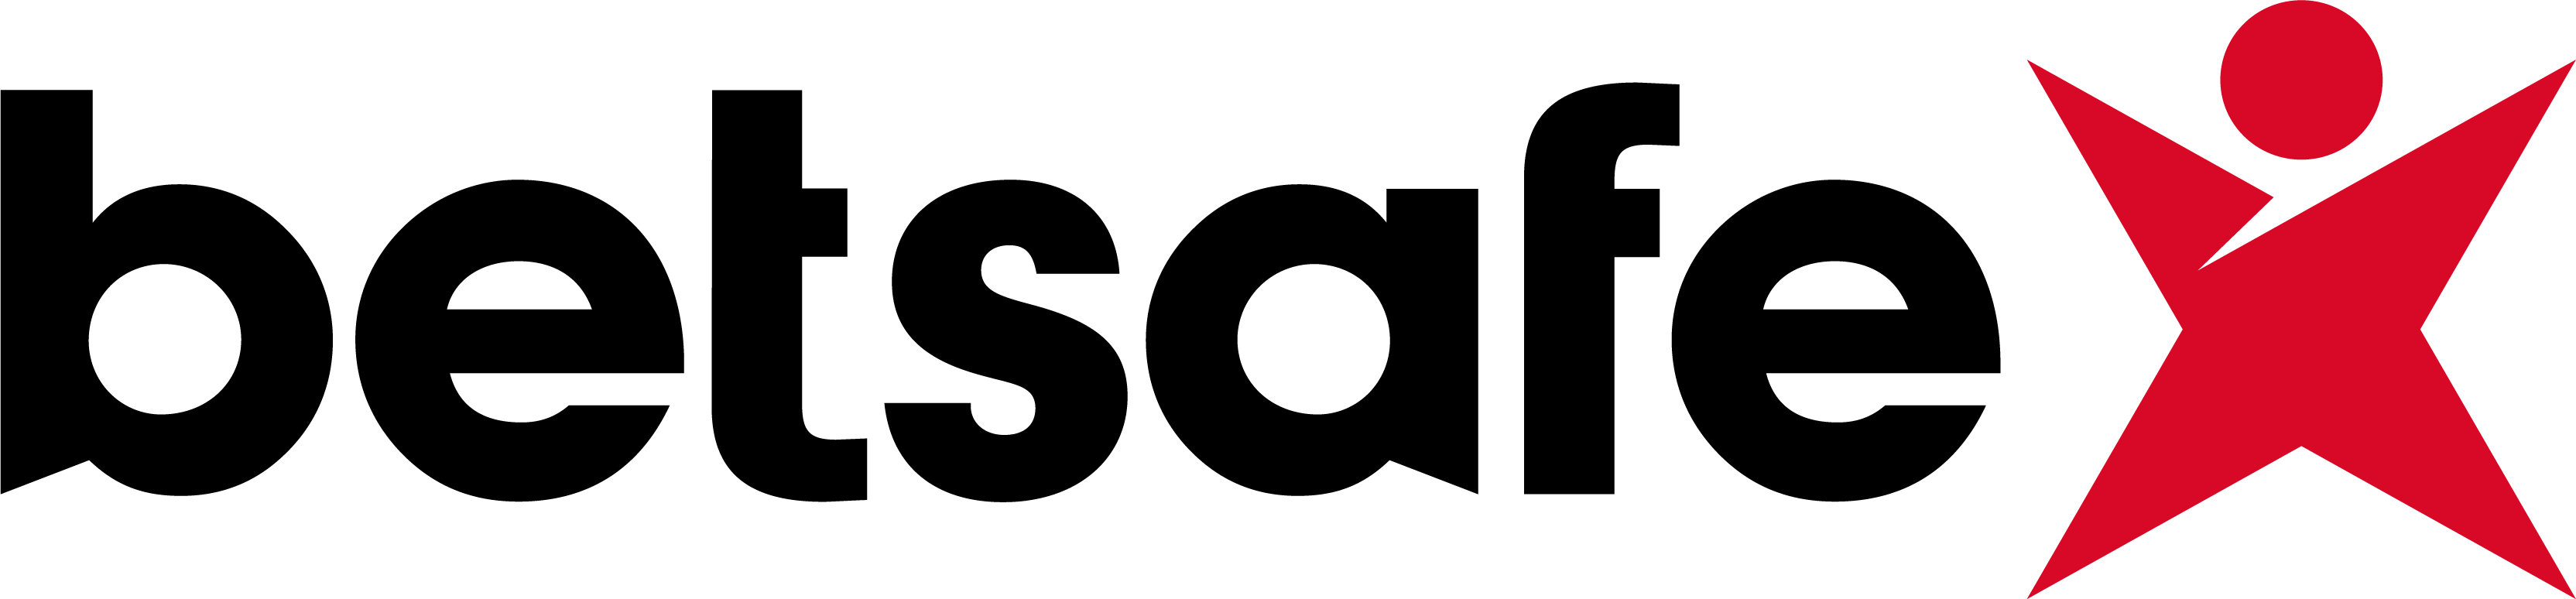 BetsafeCasino logo